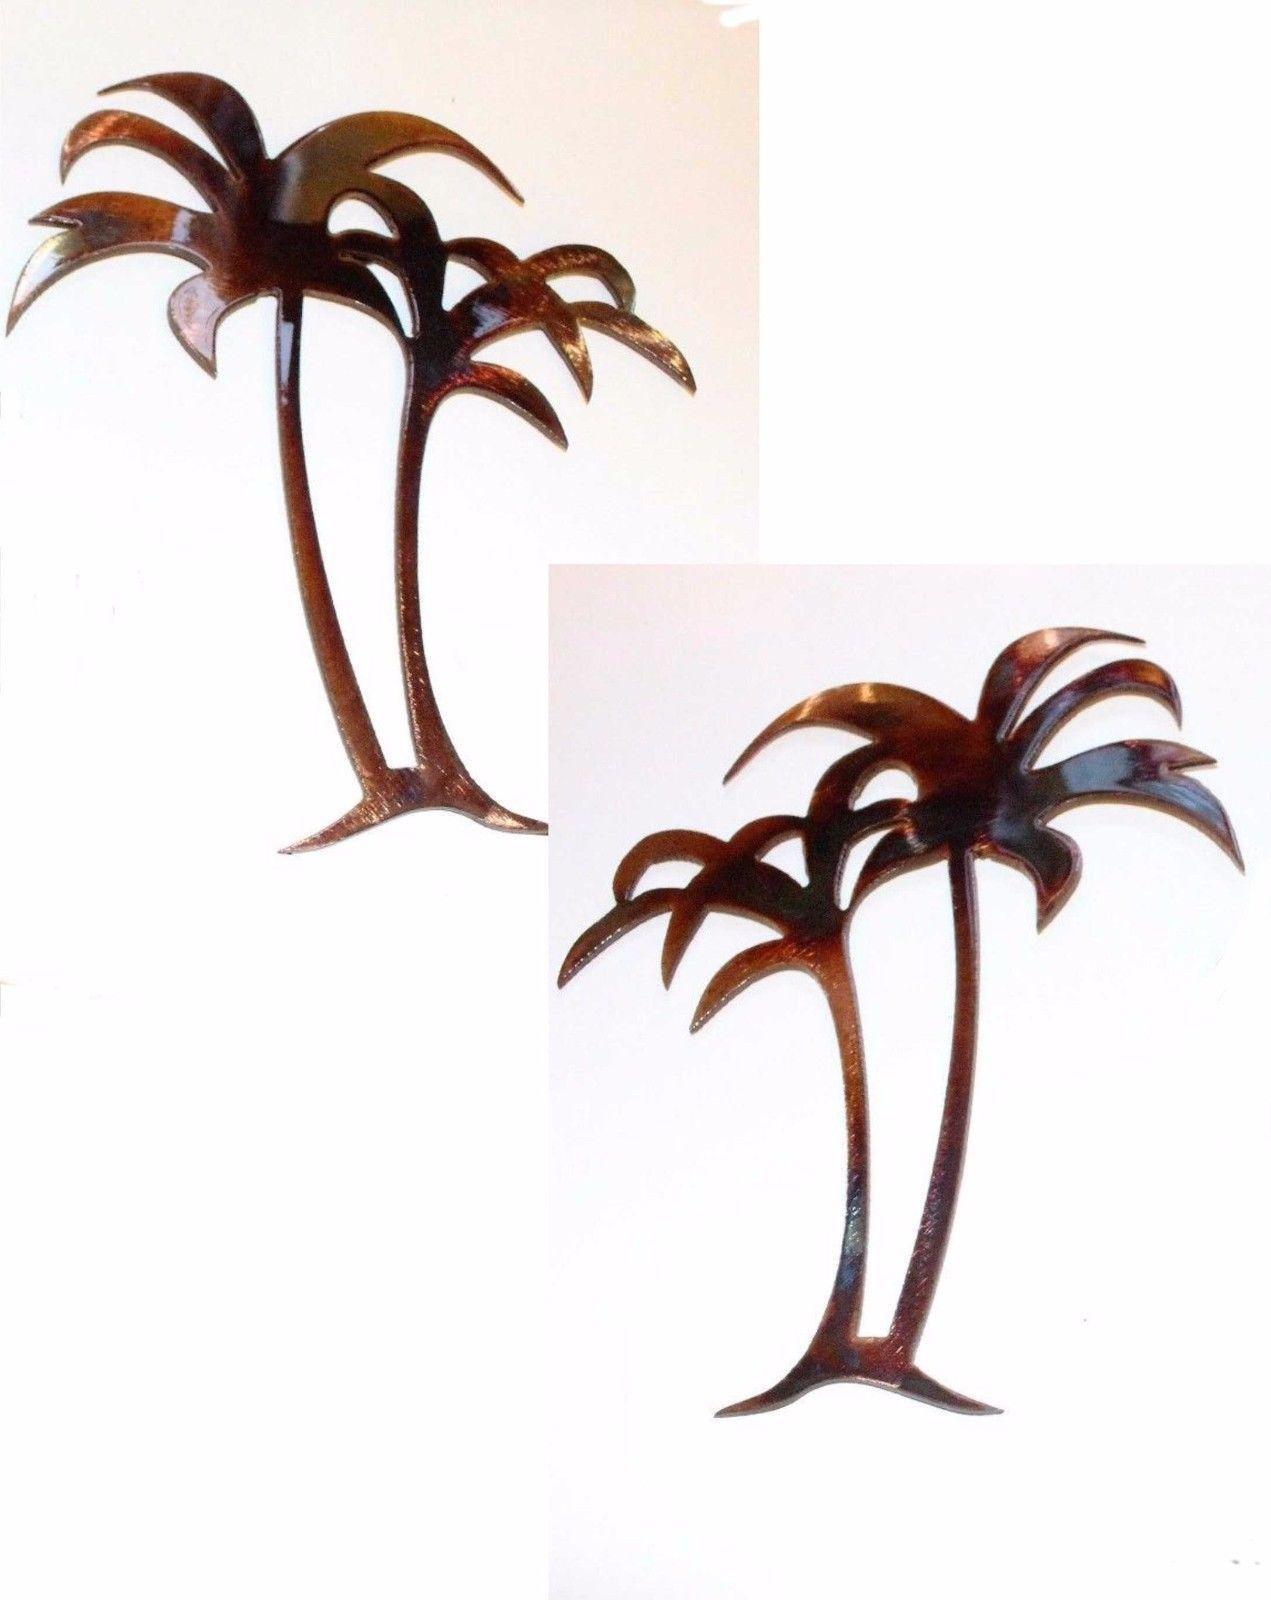 "Palm Trees Mirrored Pair 30"" Tall Metal Wall Art Decor Inside Palm Tree Metal Wall Art (View 18 of 20)"